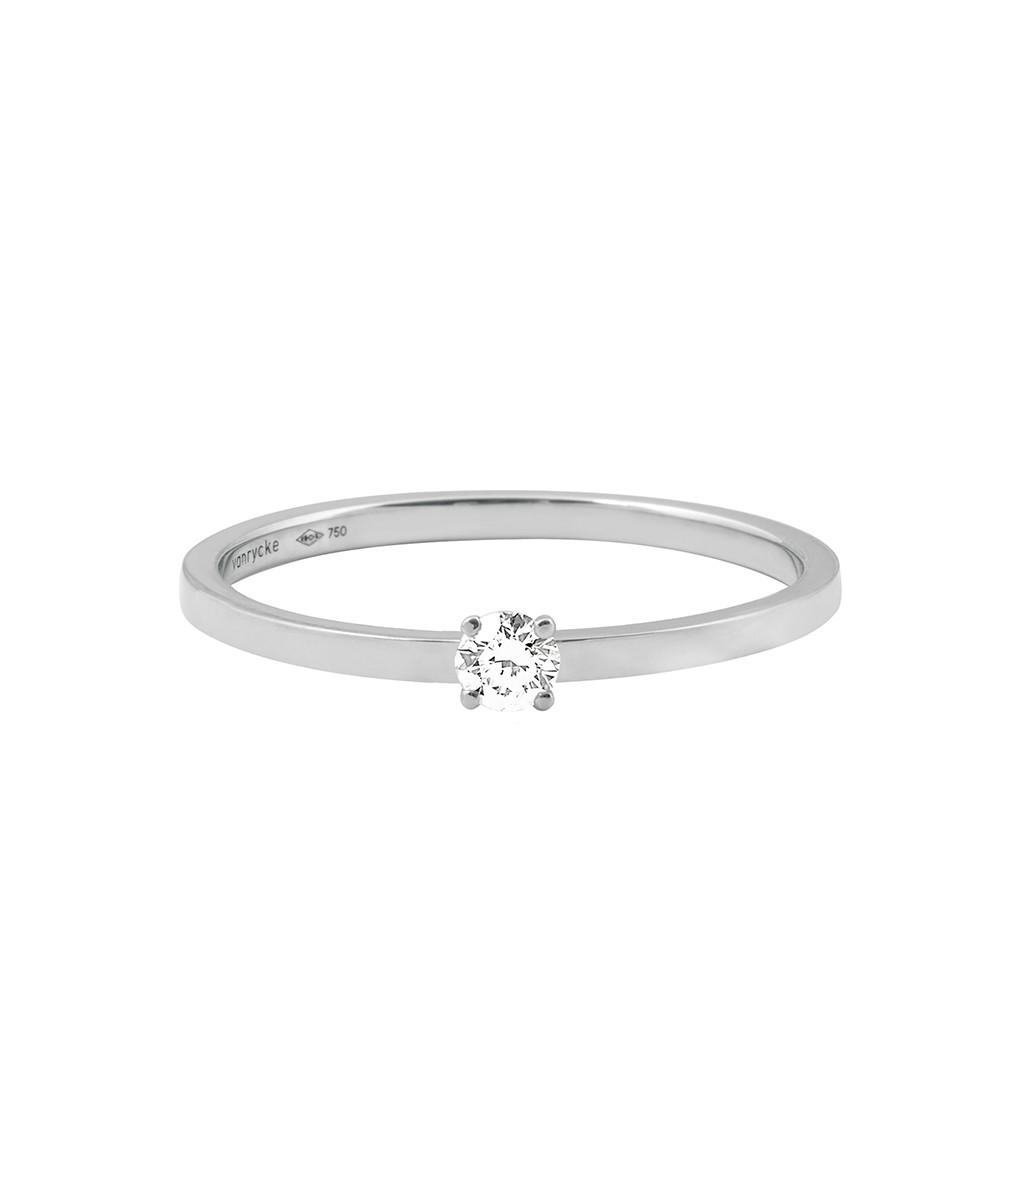 VANRYCKE - Bague Valentine Or Blanc Diamant